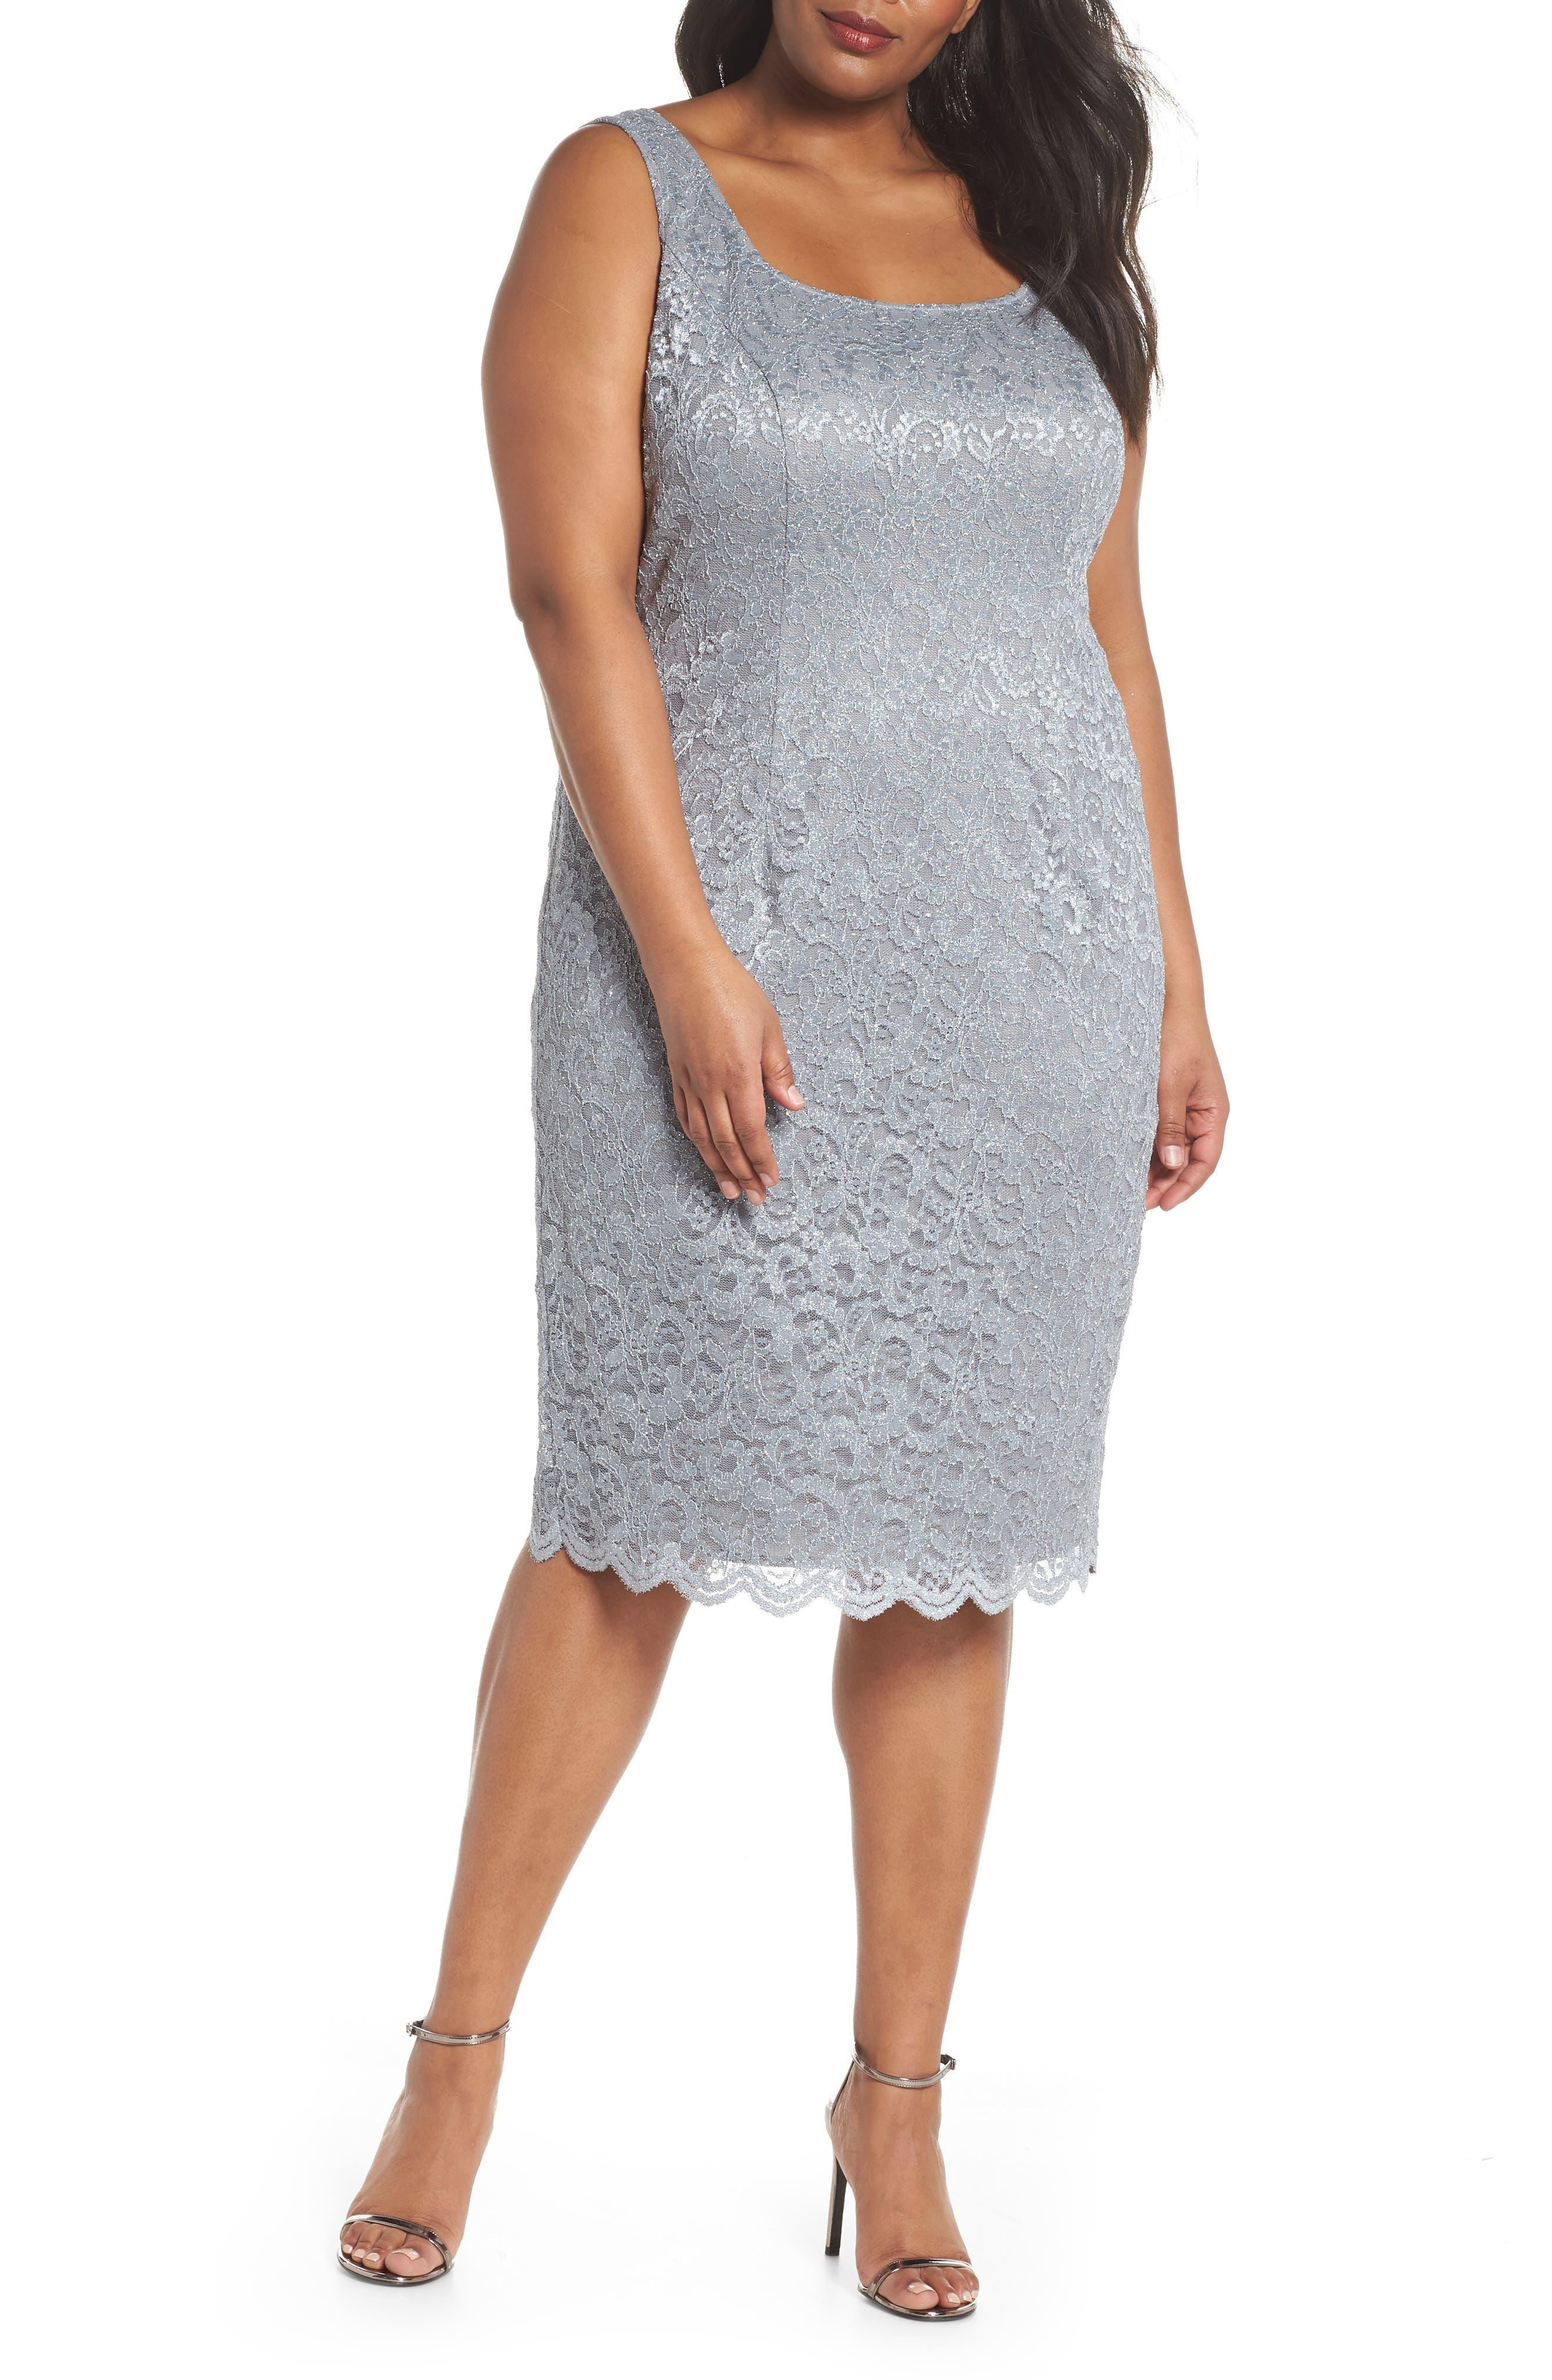 ALEX EVENINGS,                             Lace Sheath Dress with Bolero Jacket,                             Alternate thumbnail 3, color,                             040